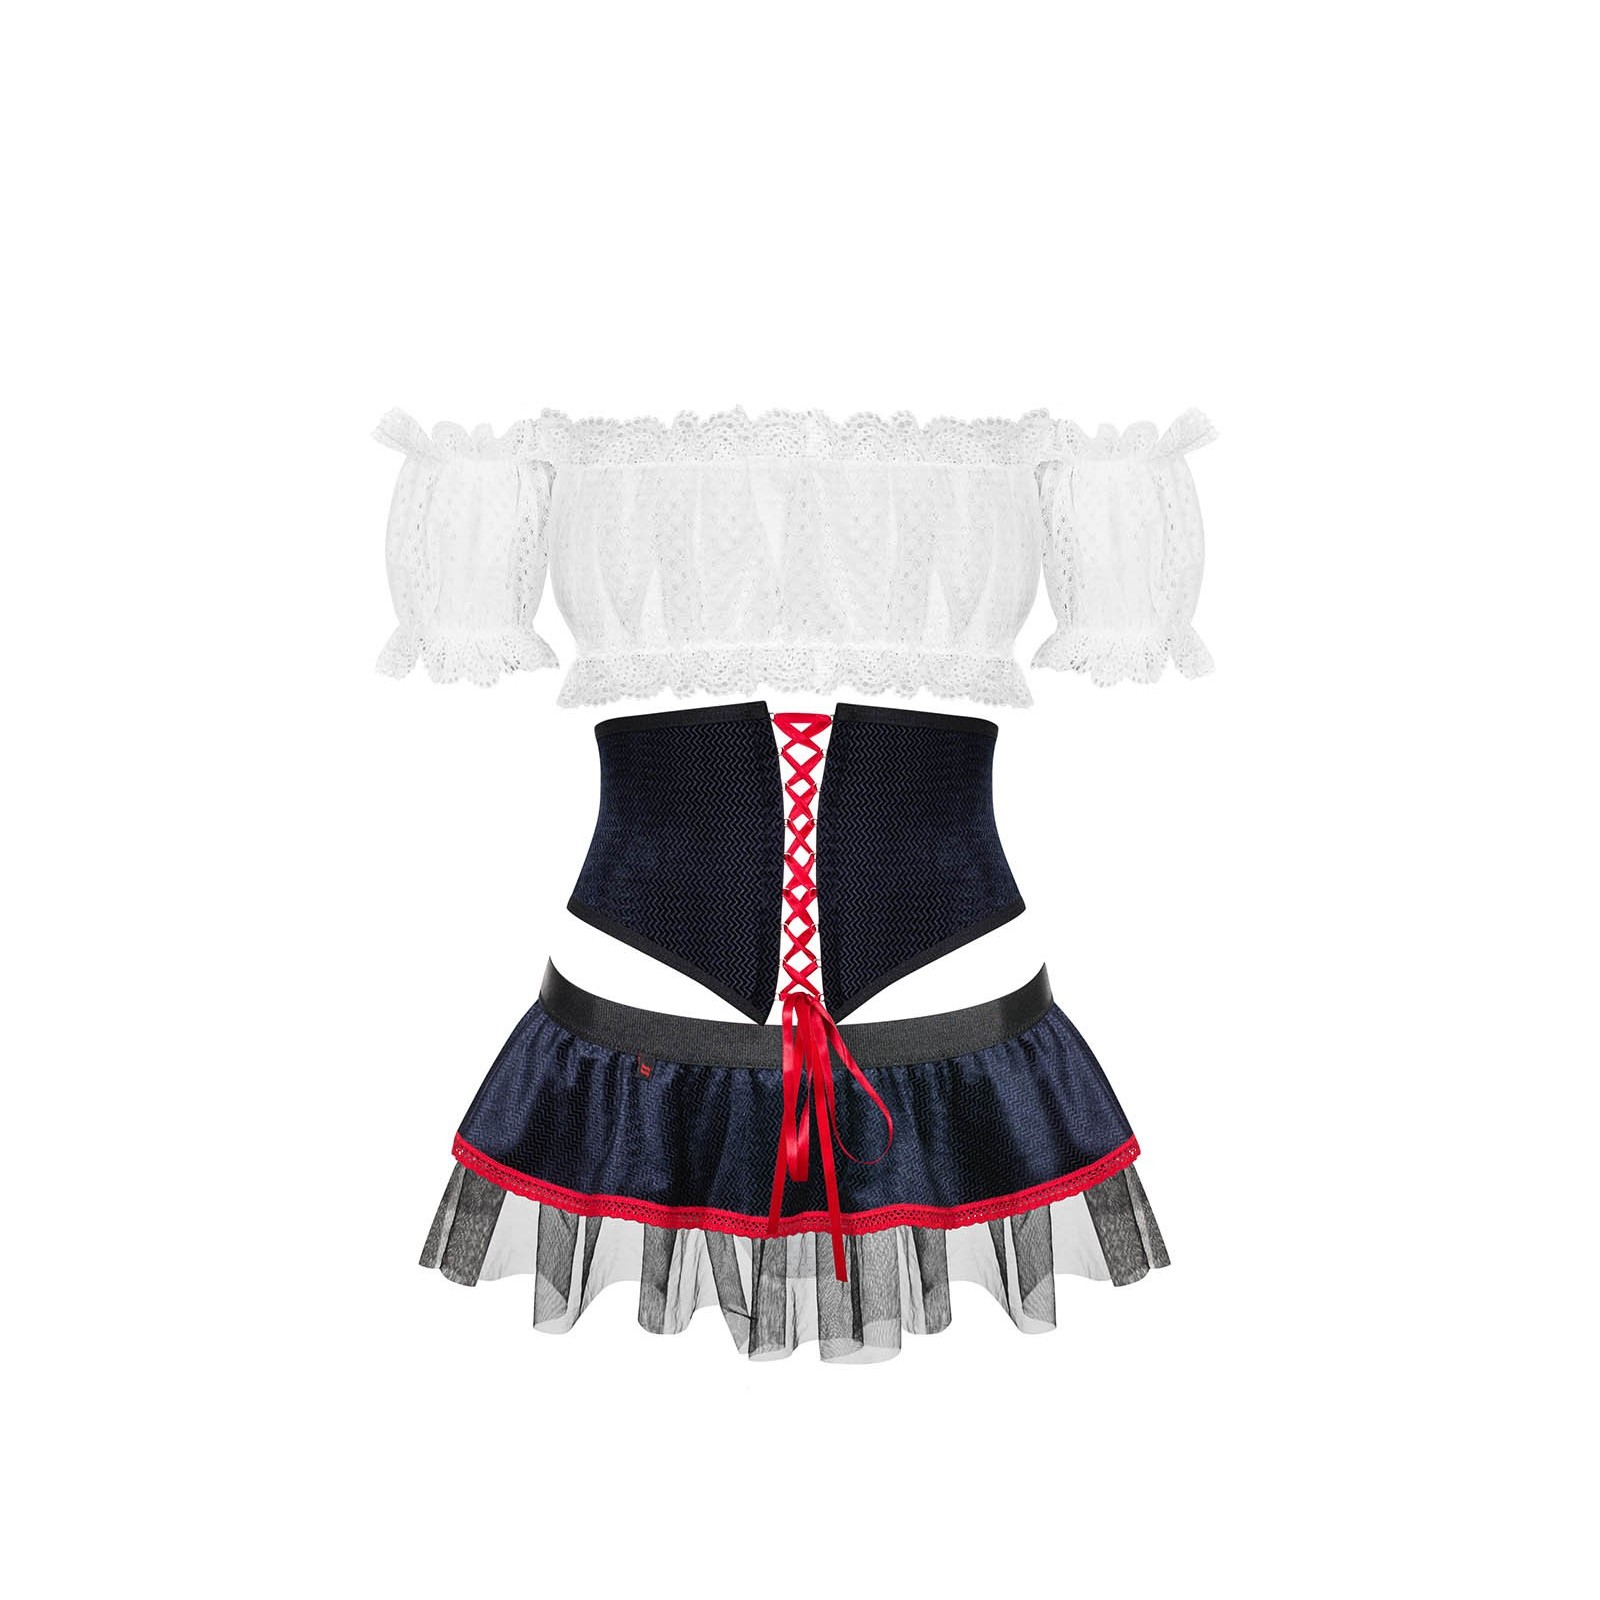 Slaviana Kostüm - 5 - Vorschaubild